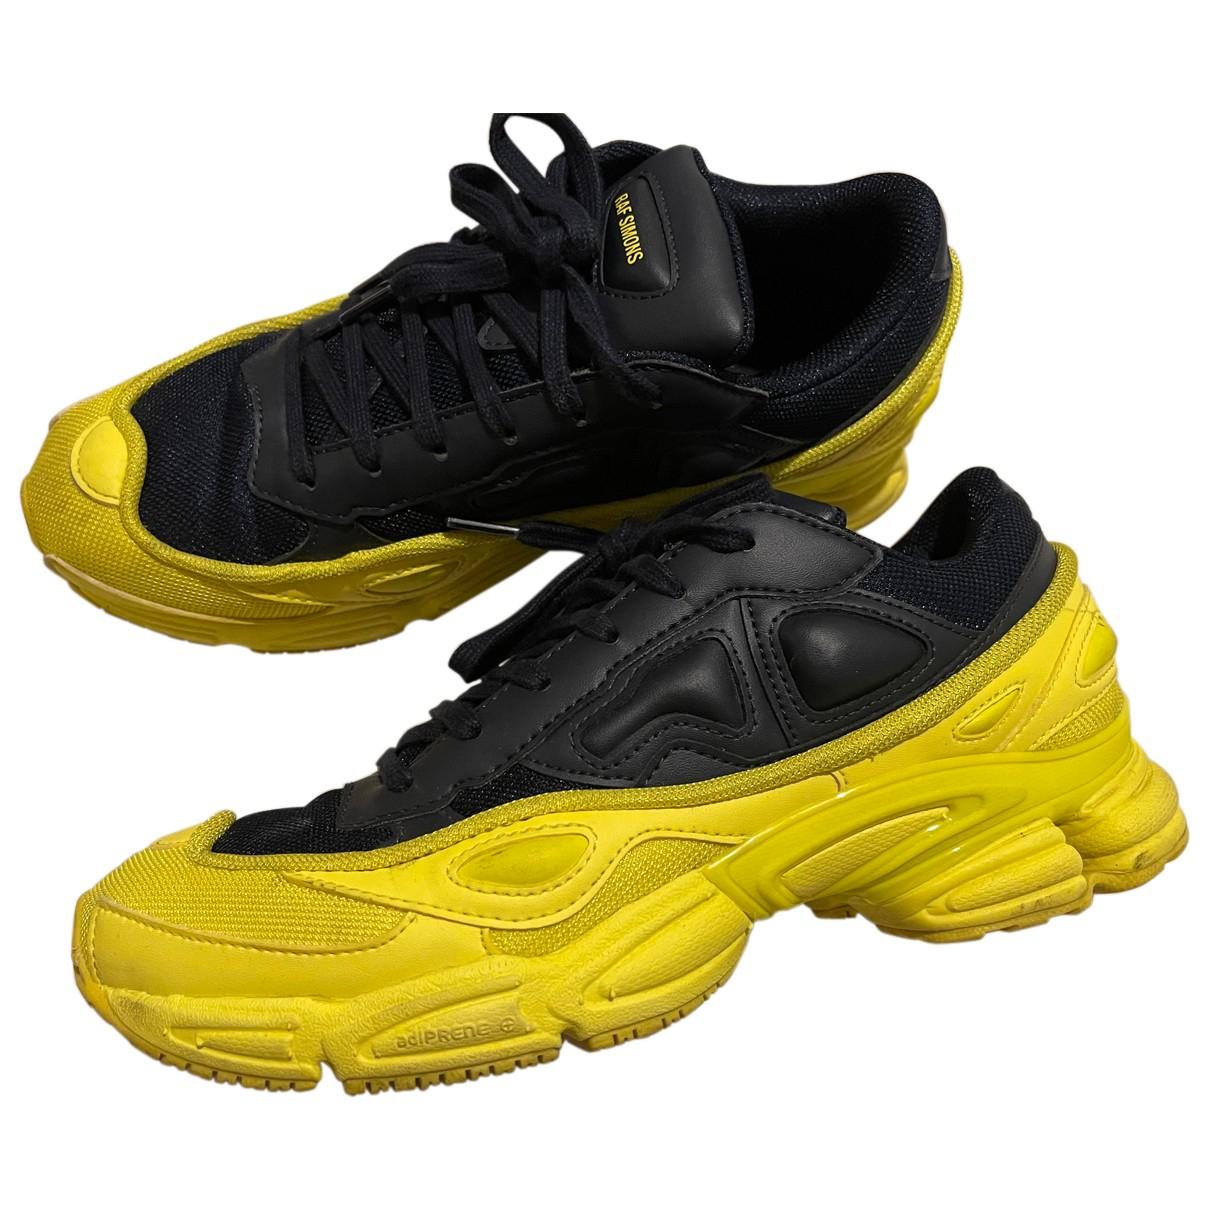 Adidas X Raf Simons Ozweego 2 Yellow Cloth Trainers for Men 41 EU